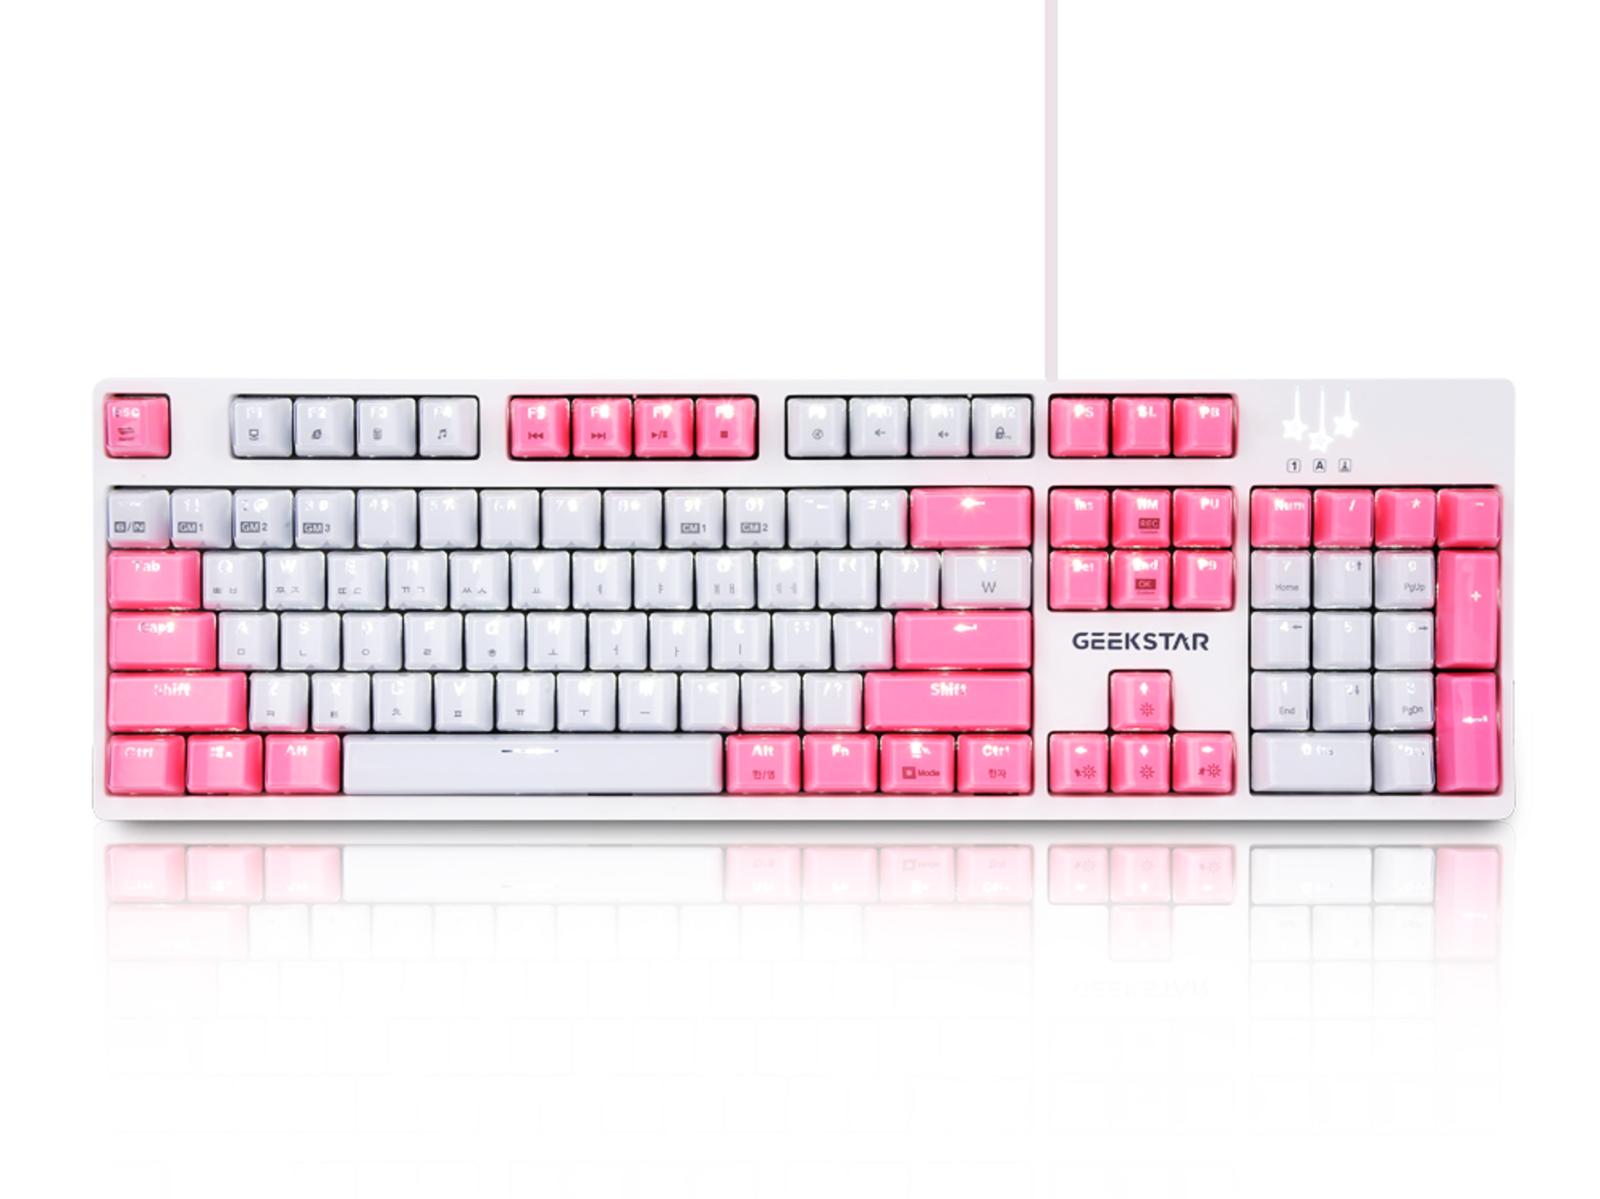 Geekstar gk801 2 keyboard 01